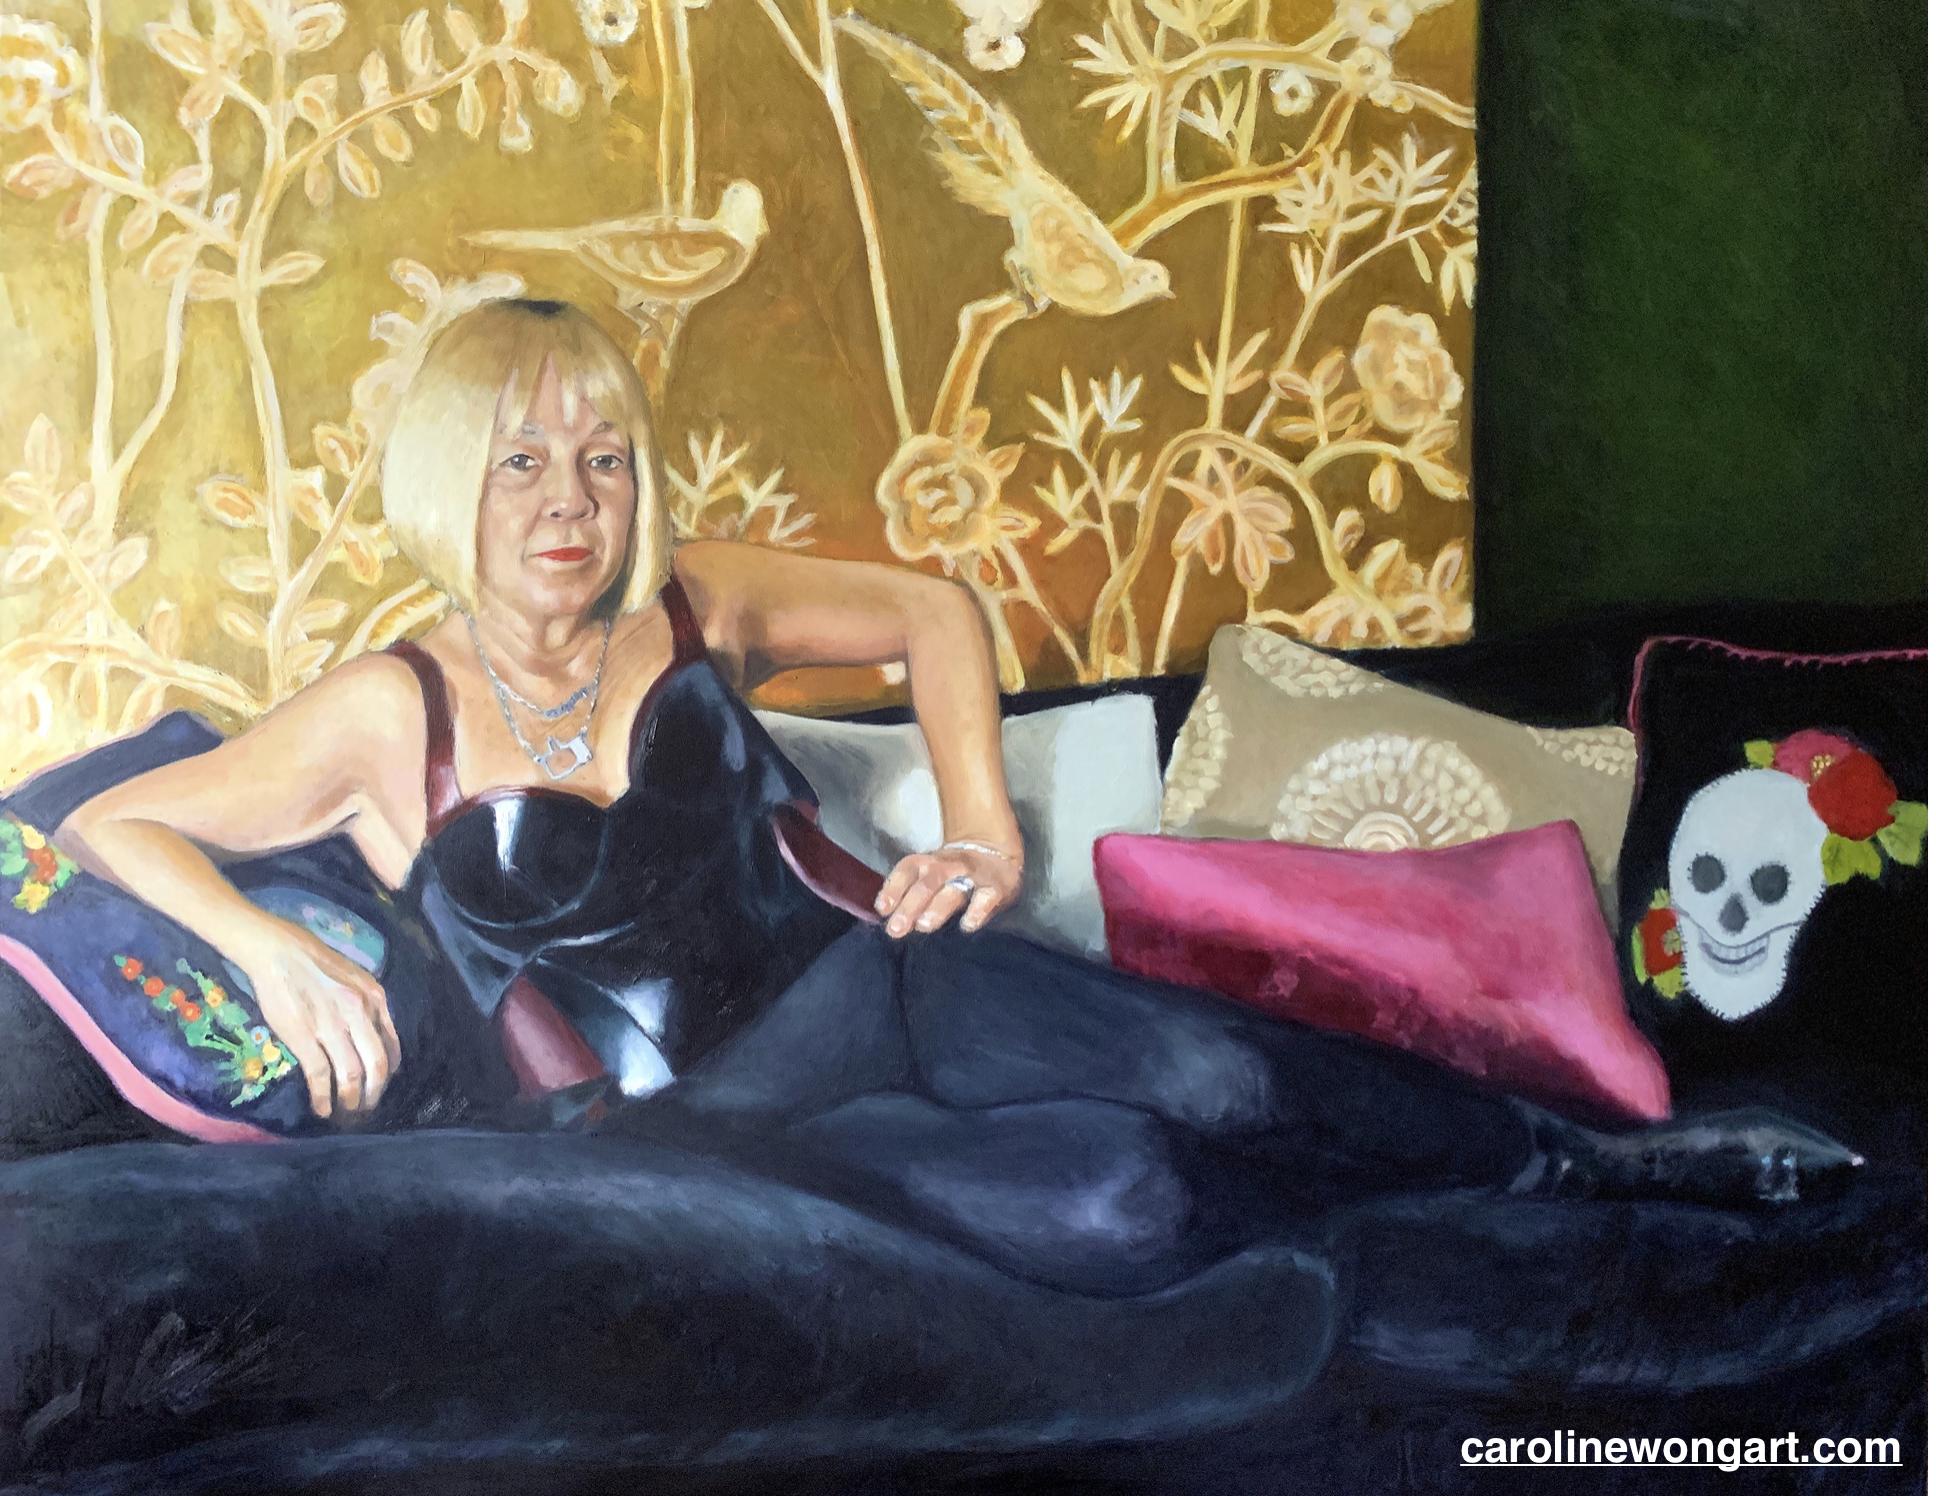 Smoke & Flowers (Cindy Gallop)